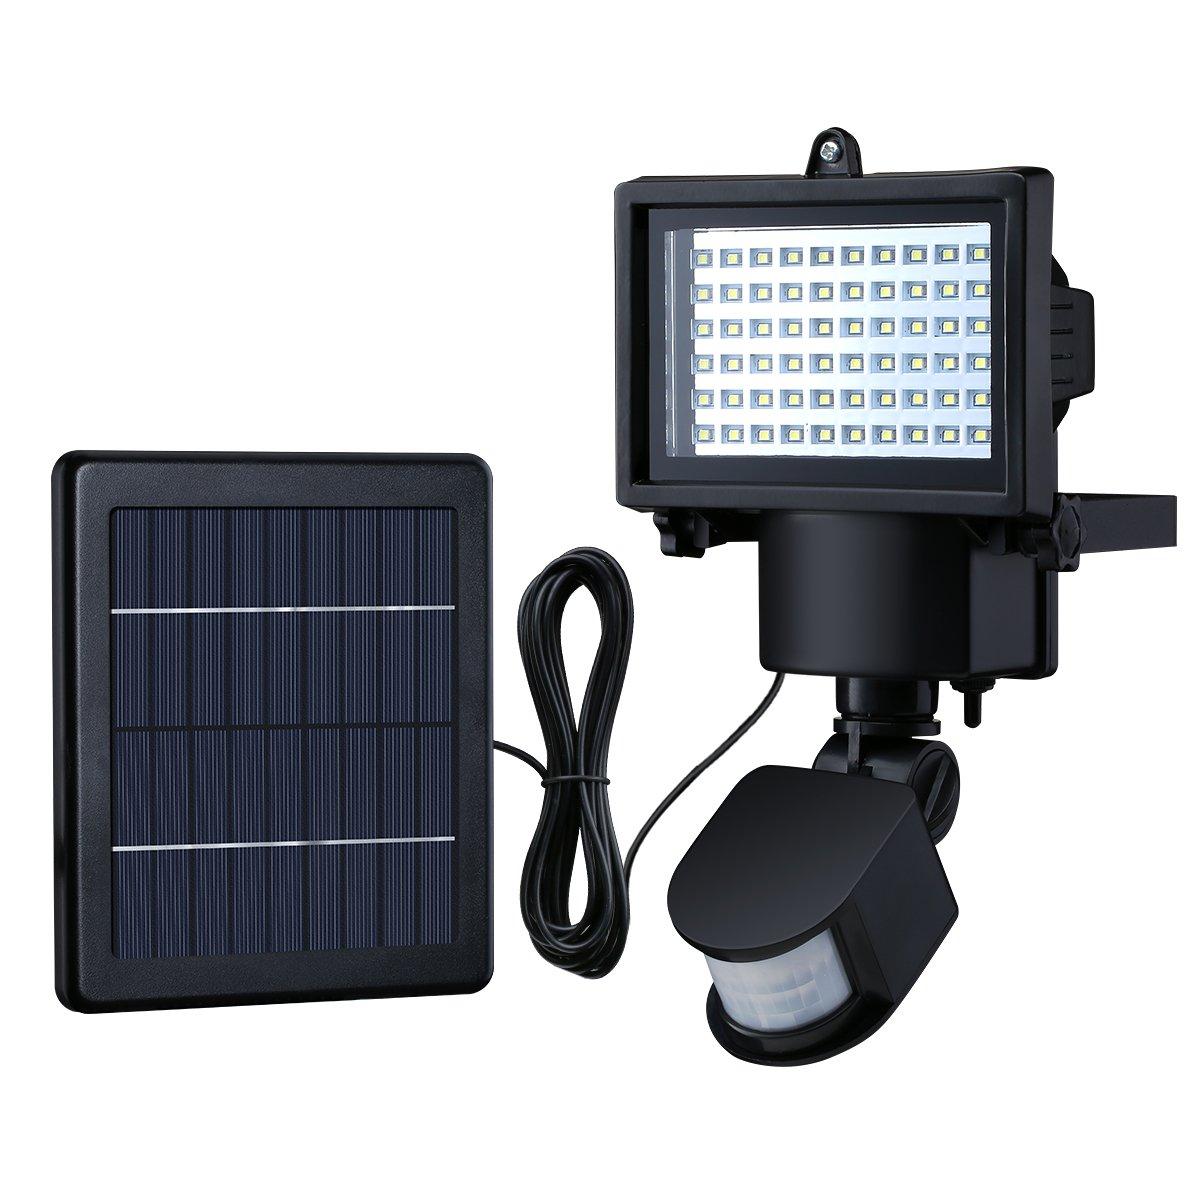 Litom lsl14 bright 60 led solar lights outdoor solar security lights litom lsl14 bright 60 led solar lights outdoor solar security lights with motion sensor aloadofball Images